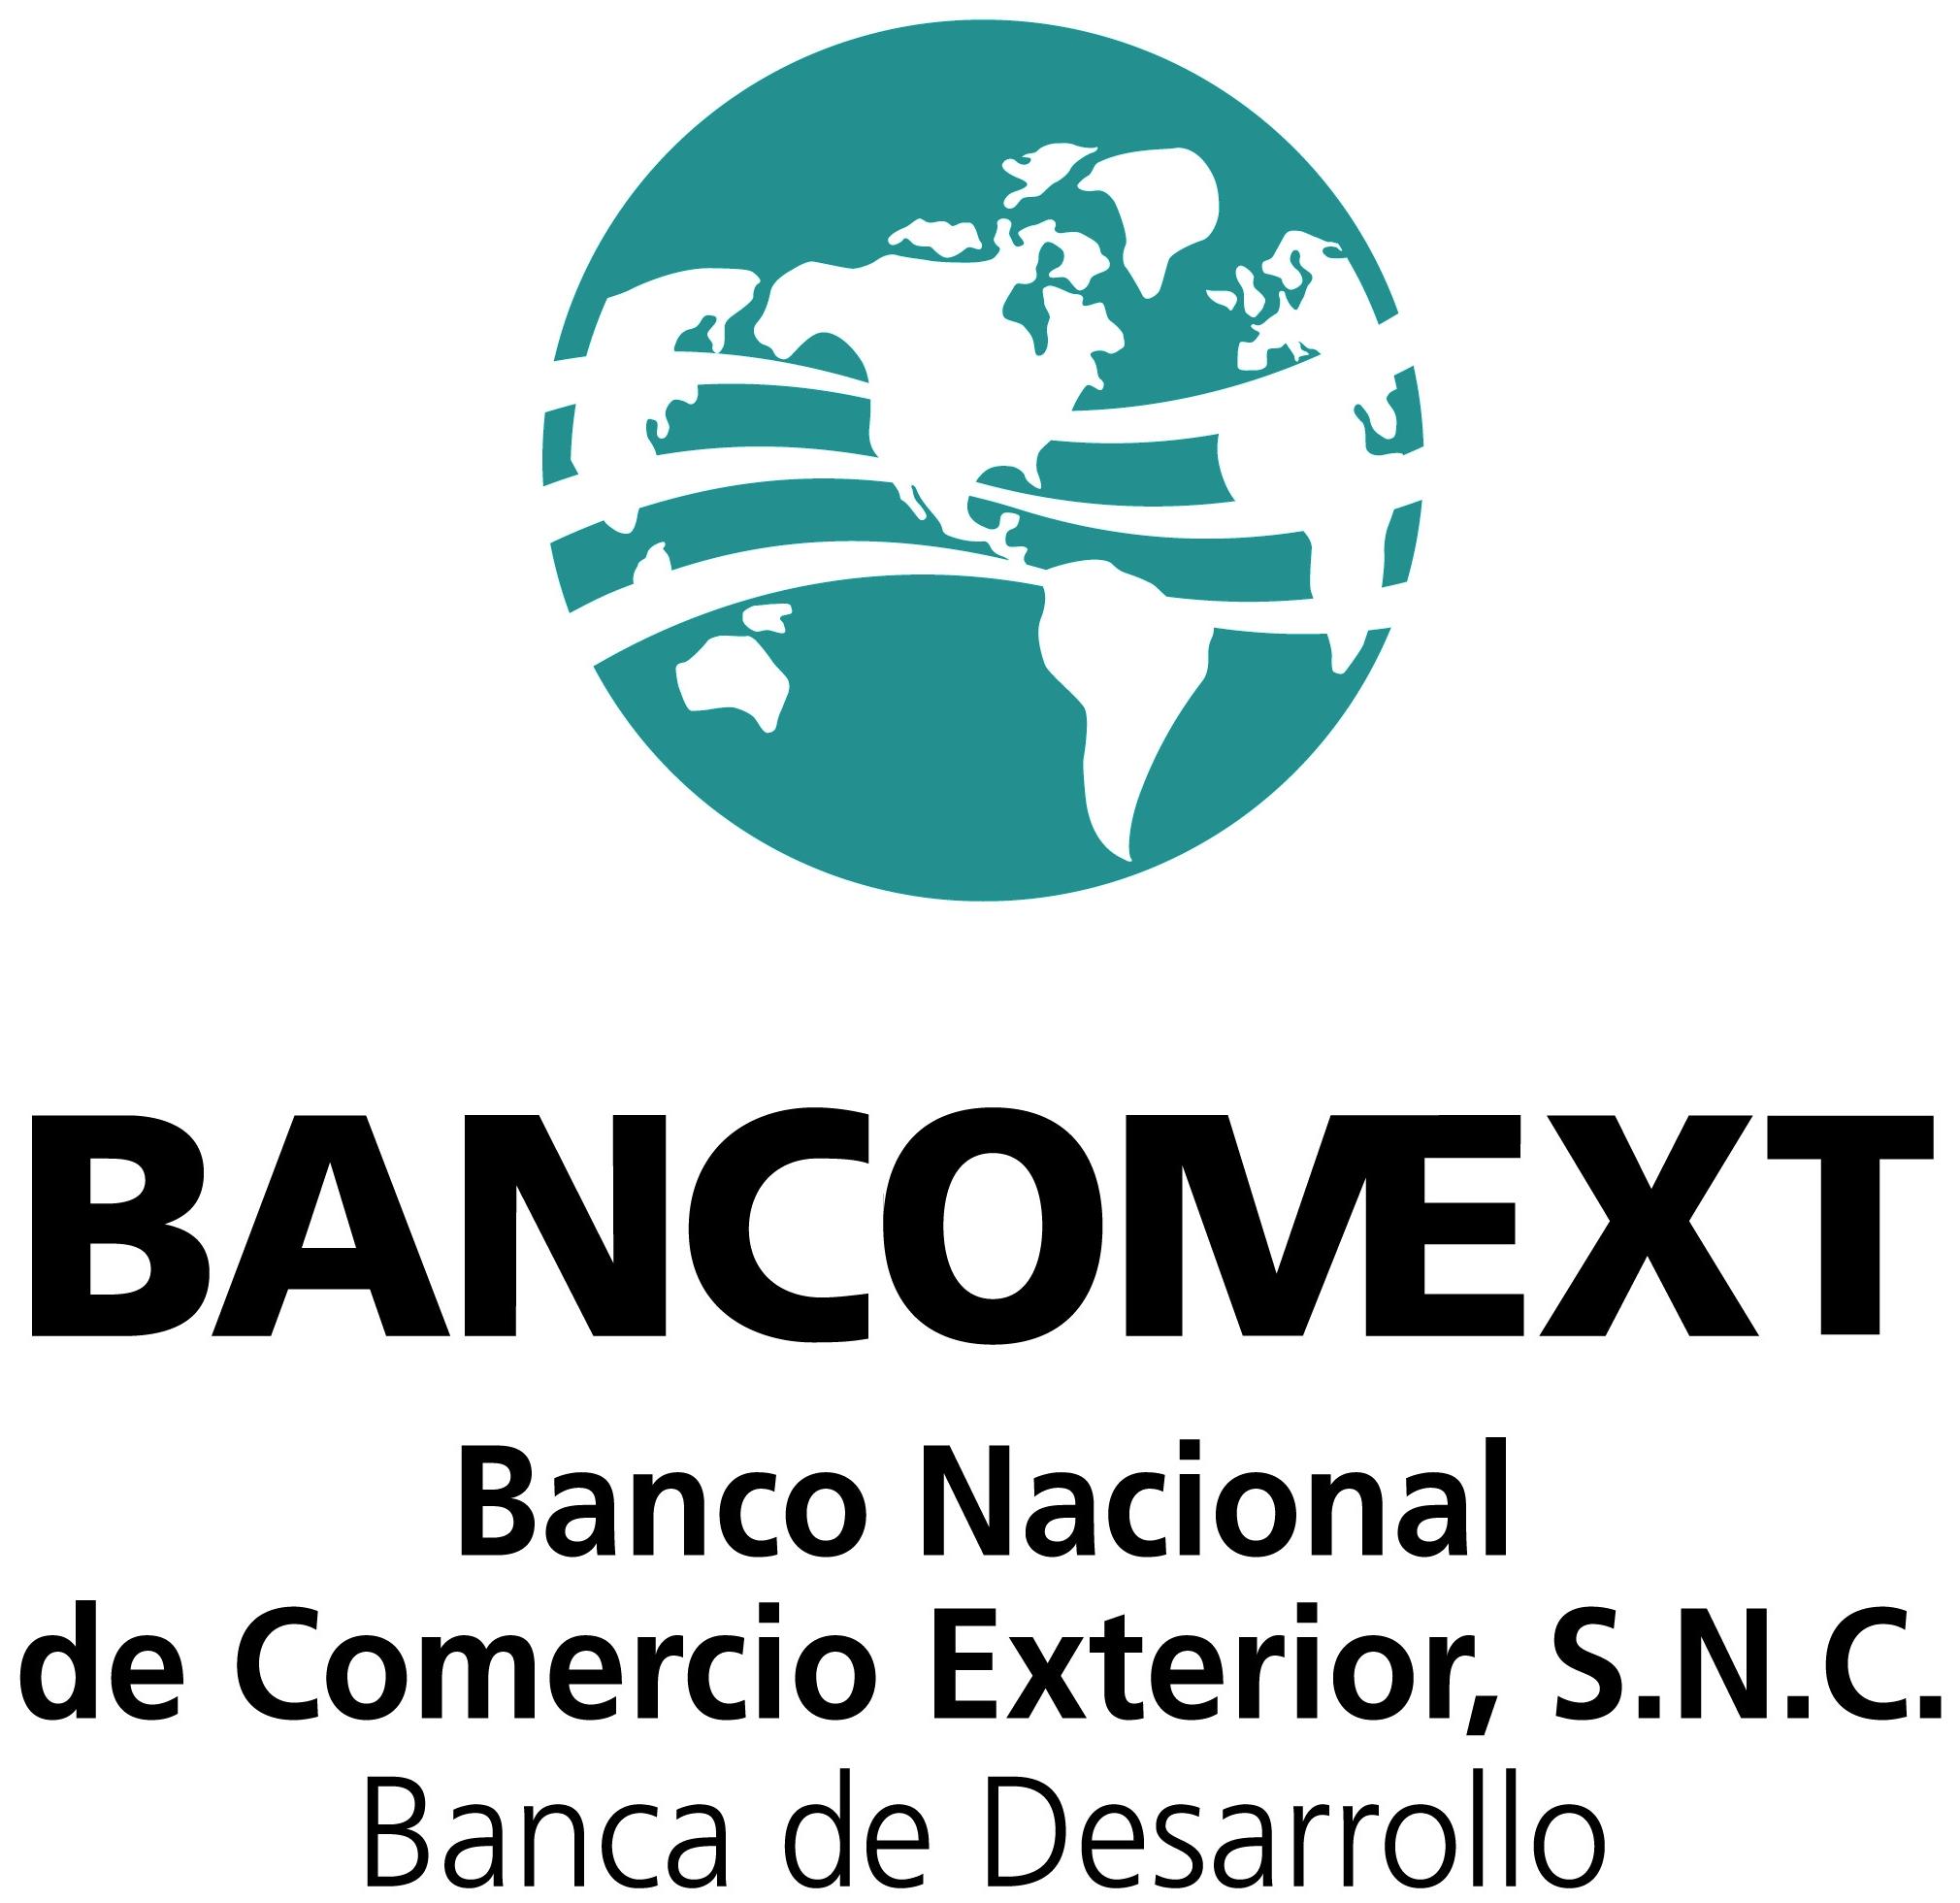 Bancomext Logo photo - 1